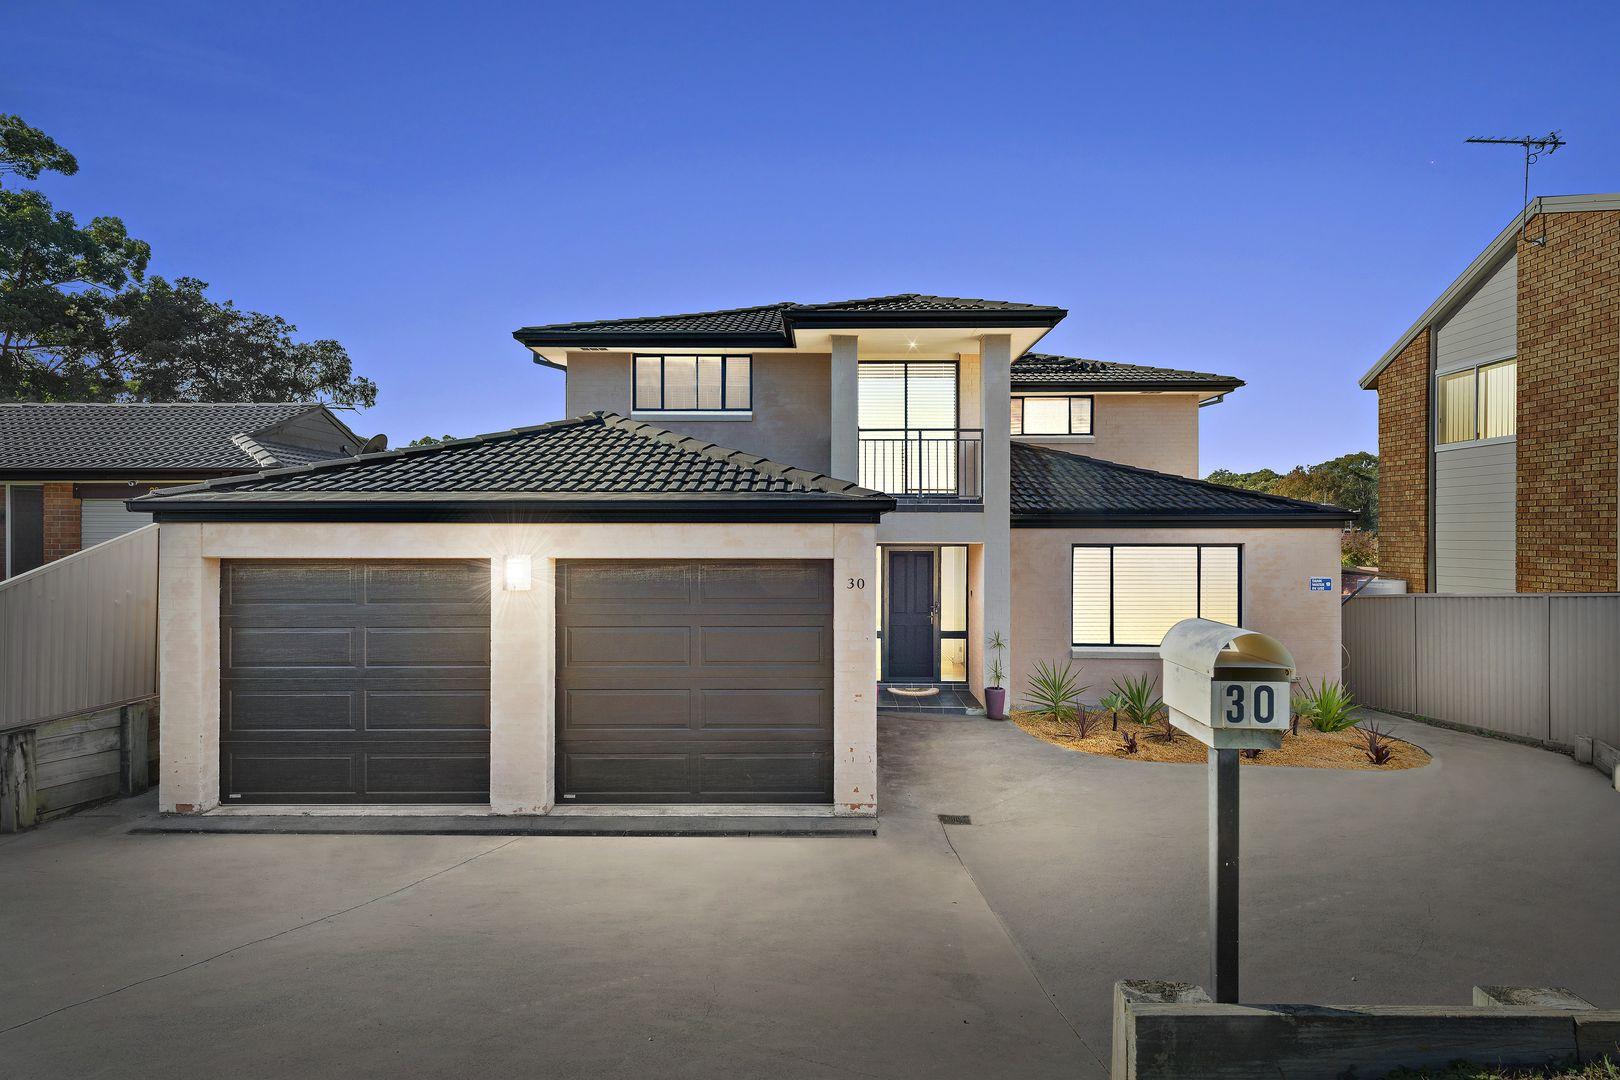 30 Elabana Avenue, Chain Valley Bay NSW 2259, Image 0